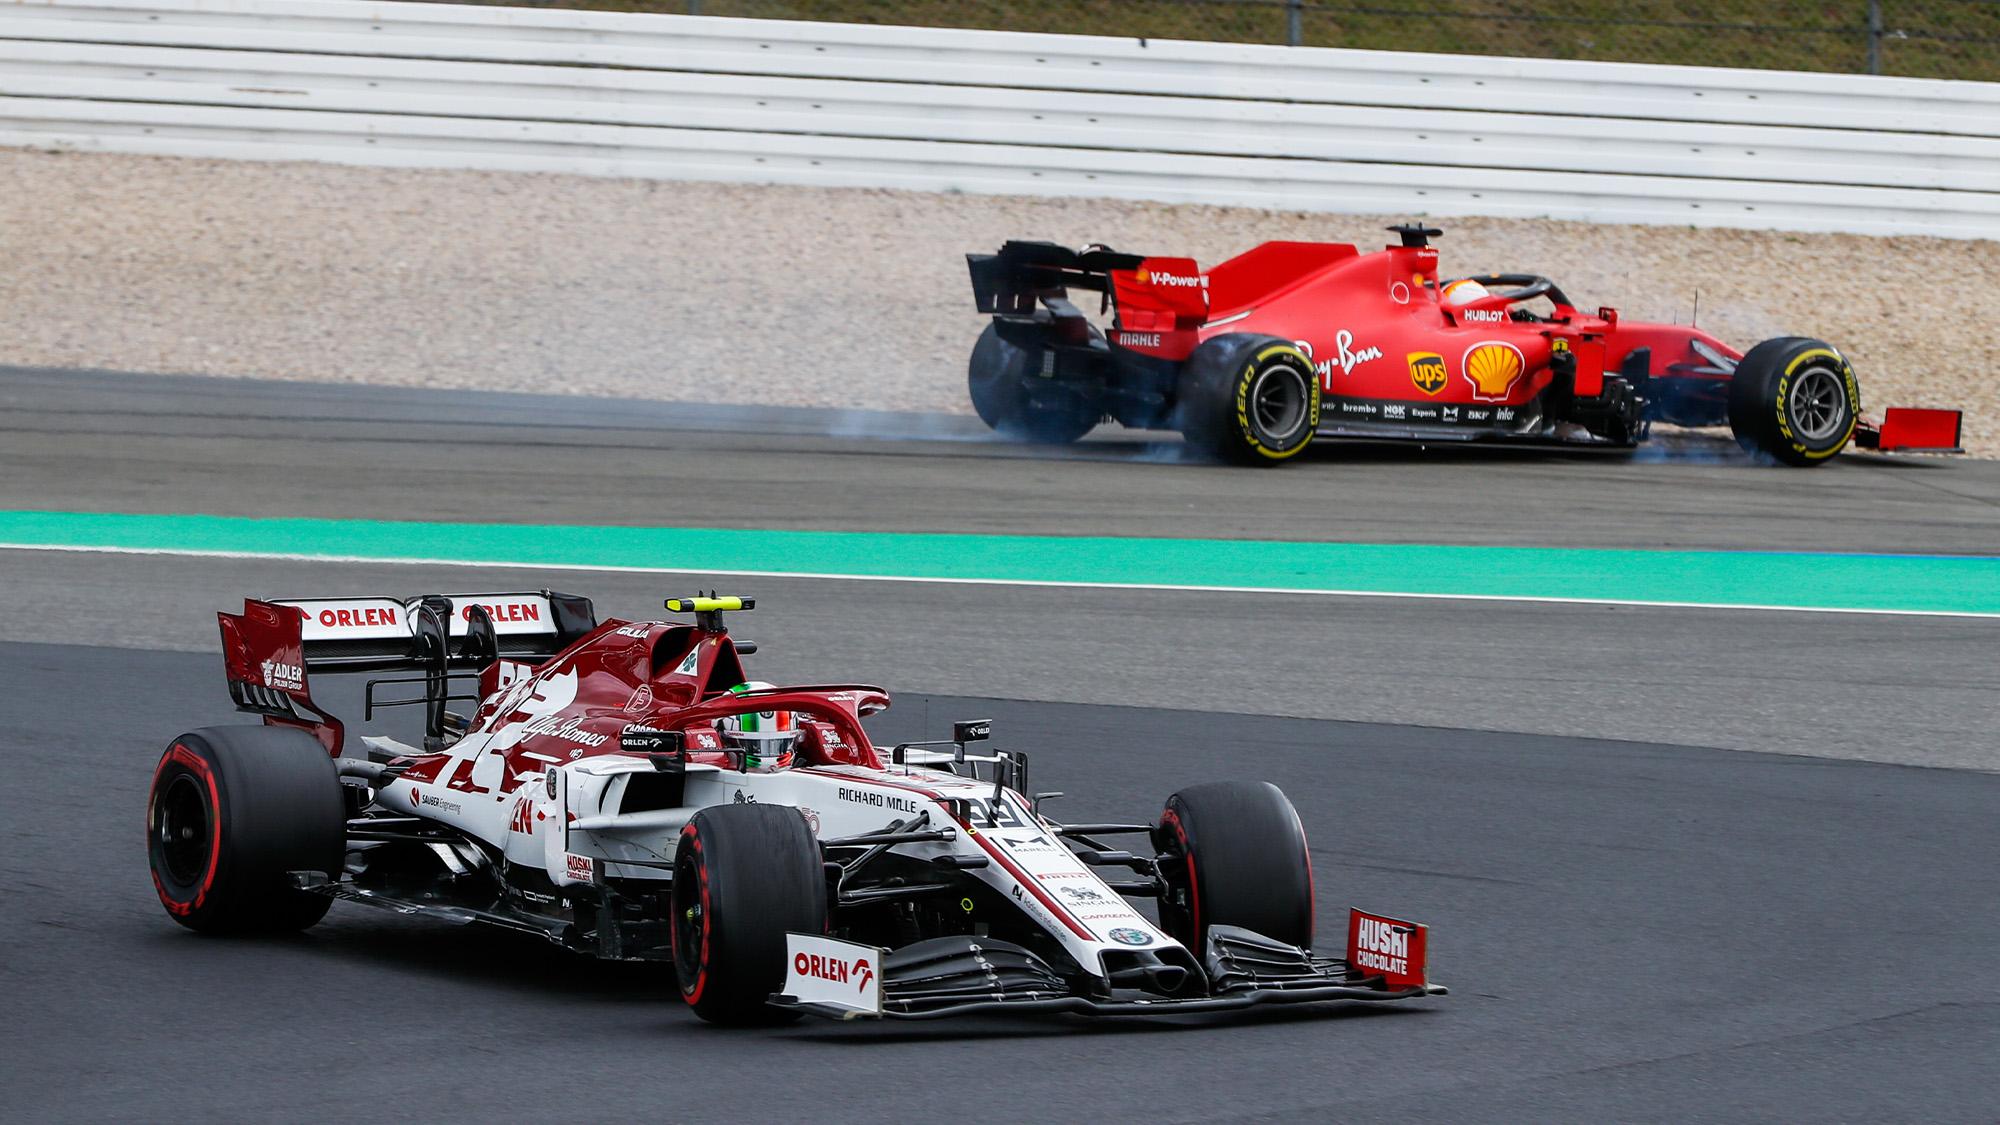 Sebastian Vettel spins off behind Antonio Giovinazzi at the Nurburgring during the 2020 F1 Eifel Grand Prix